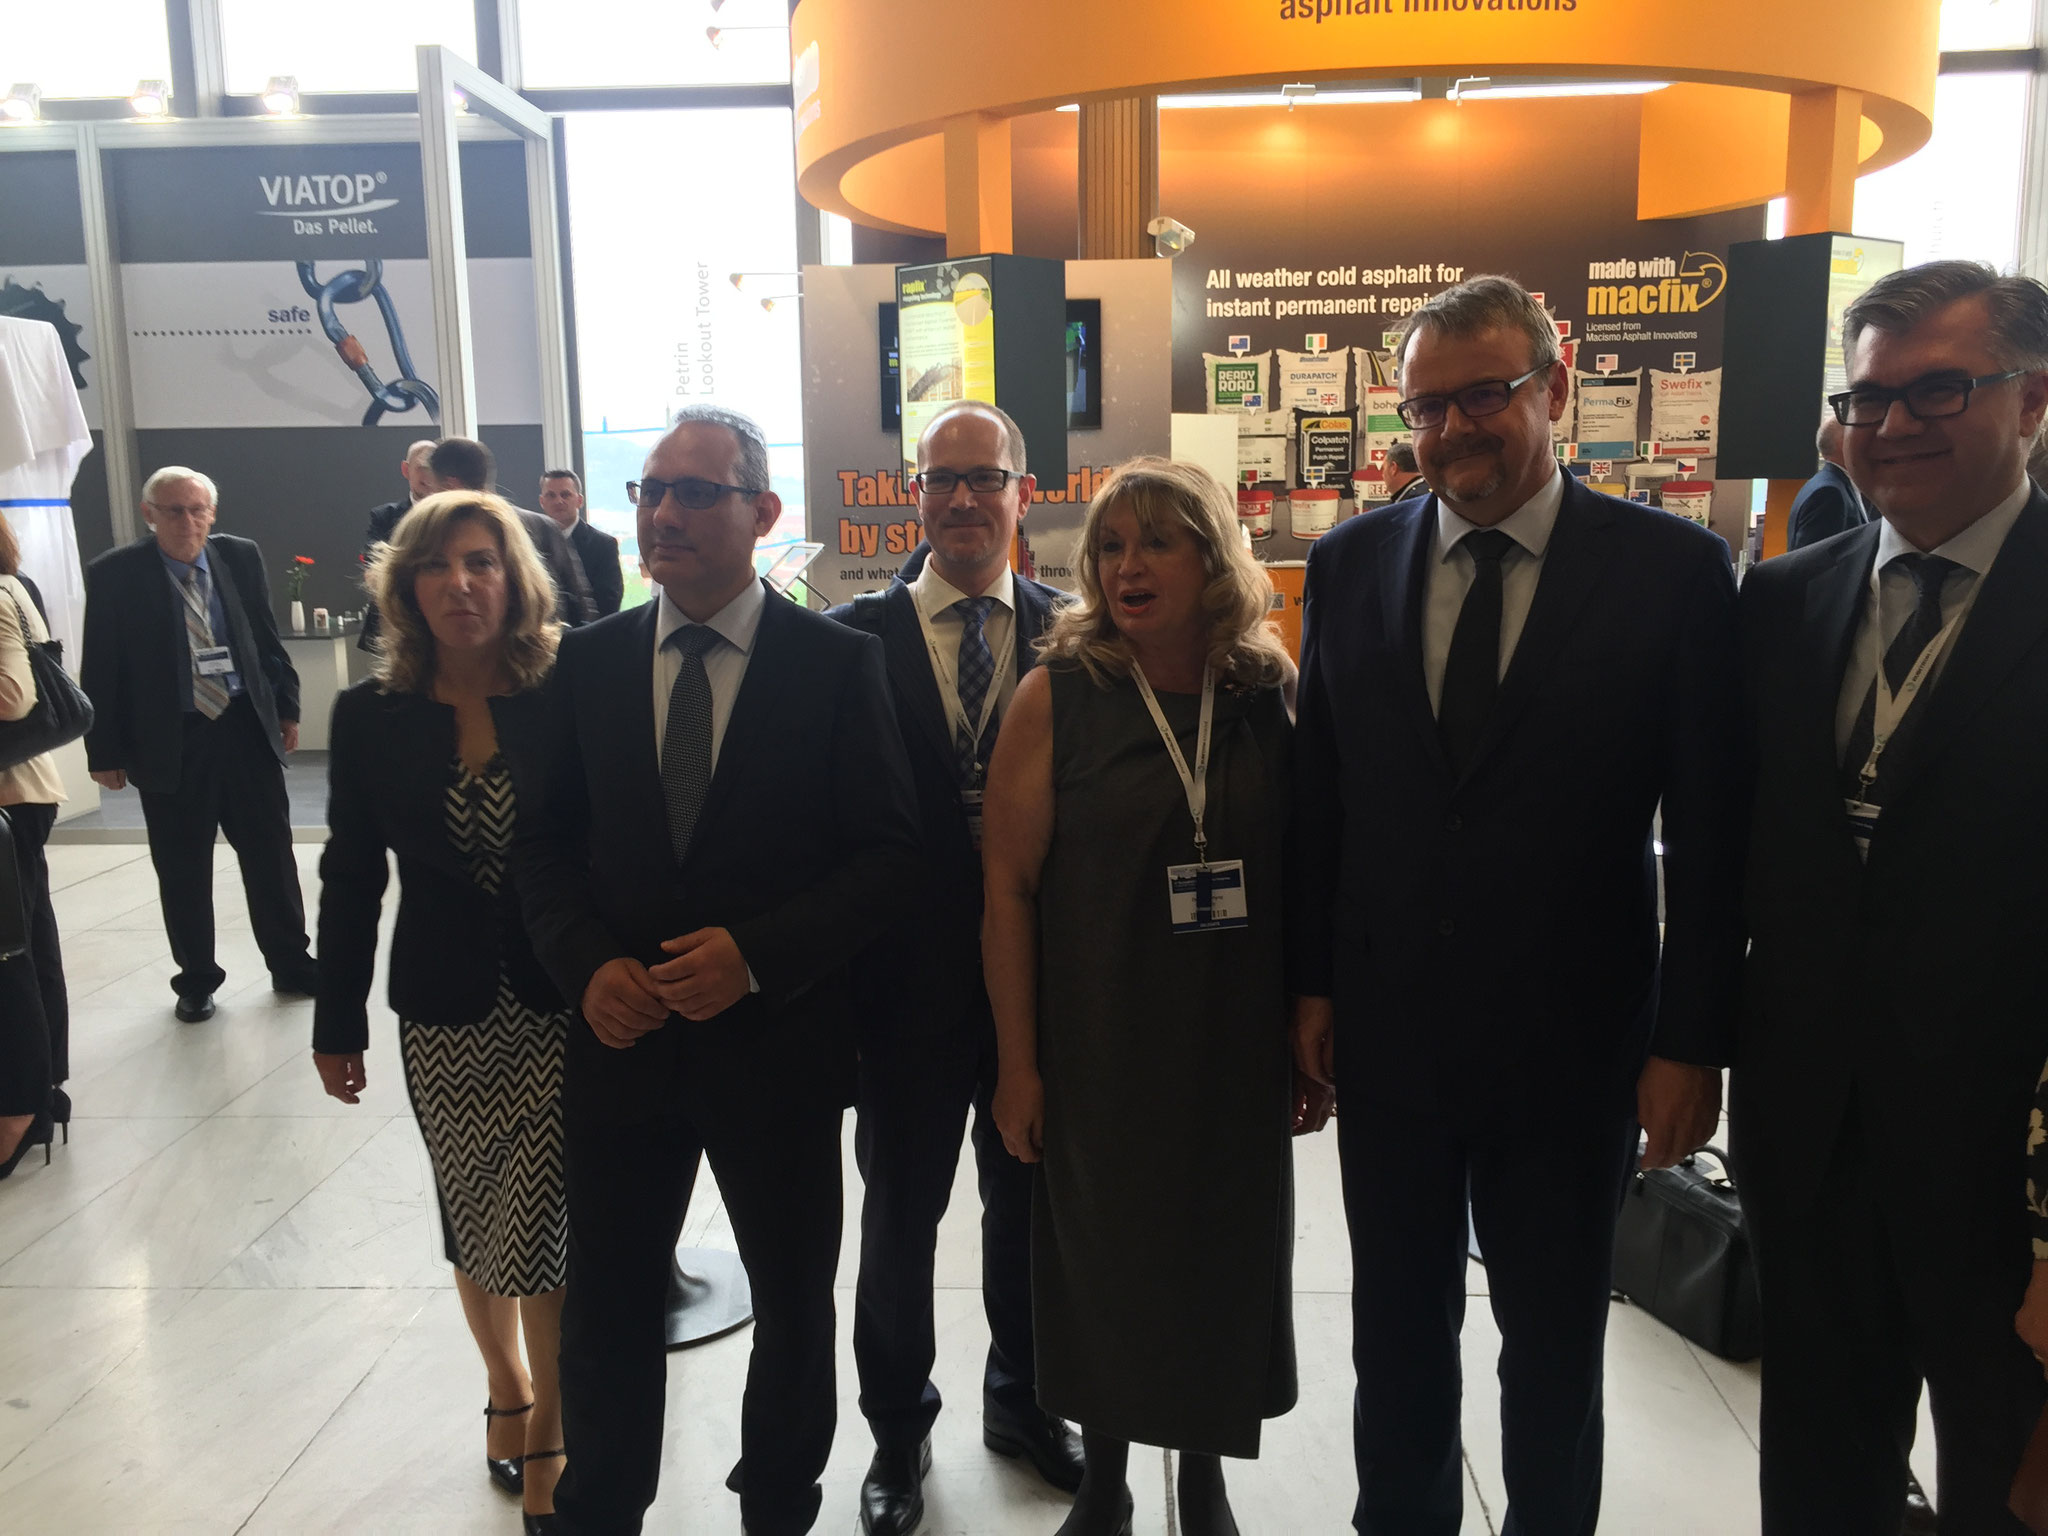 Czech Minister of Transport Dan Toc, Member of European Parliament Ismail Ertug, EAPA President Ayberk Özkan, Zeliha Temren, Derya Senyay of ASMÜD and Dr. Carsten Karcher